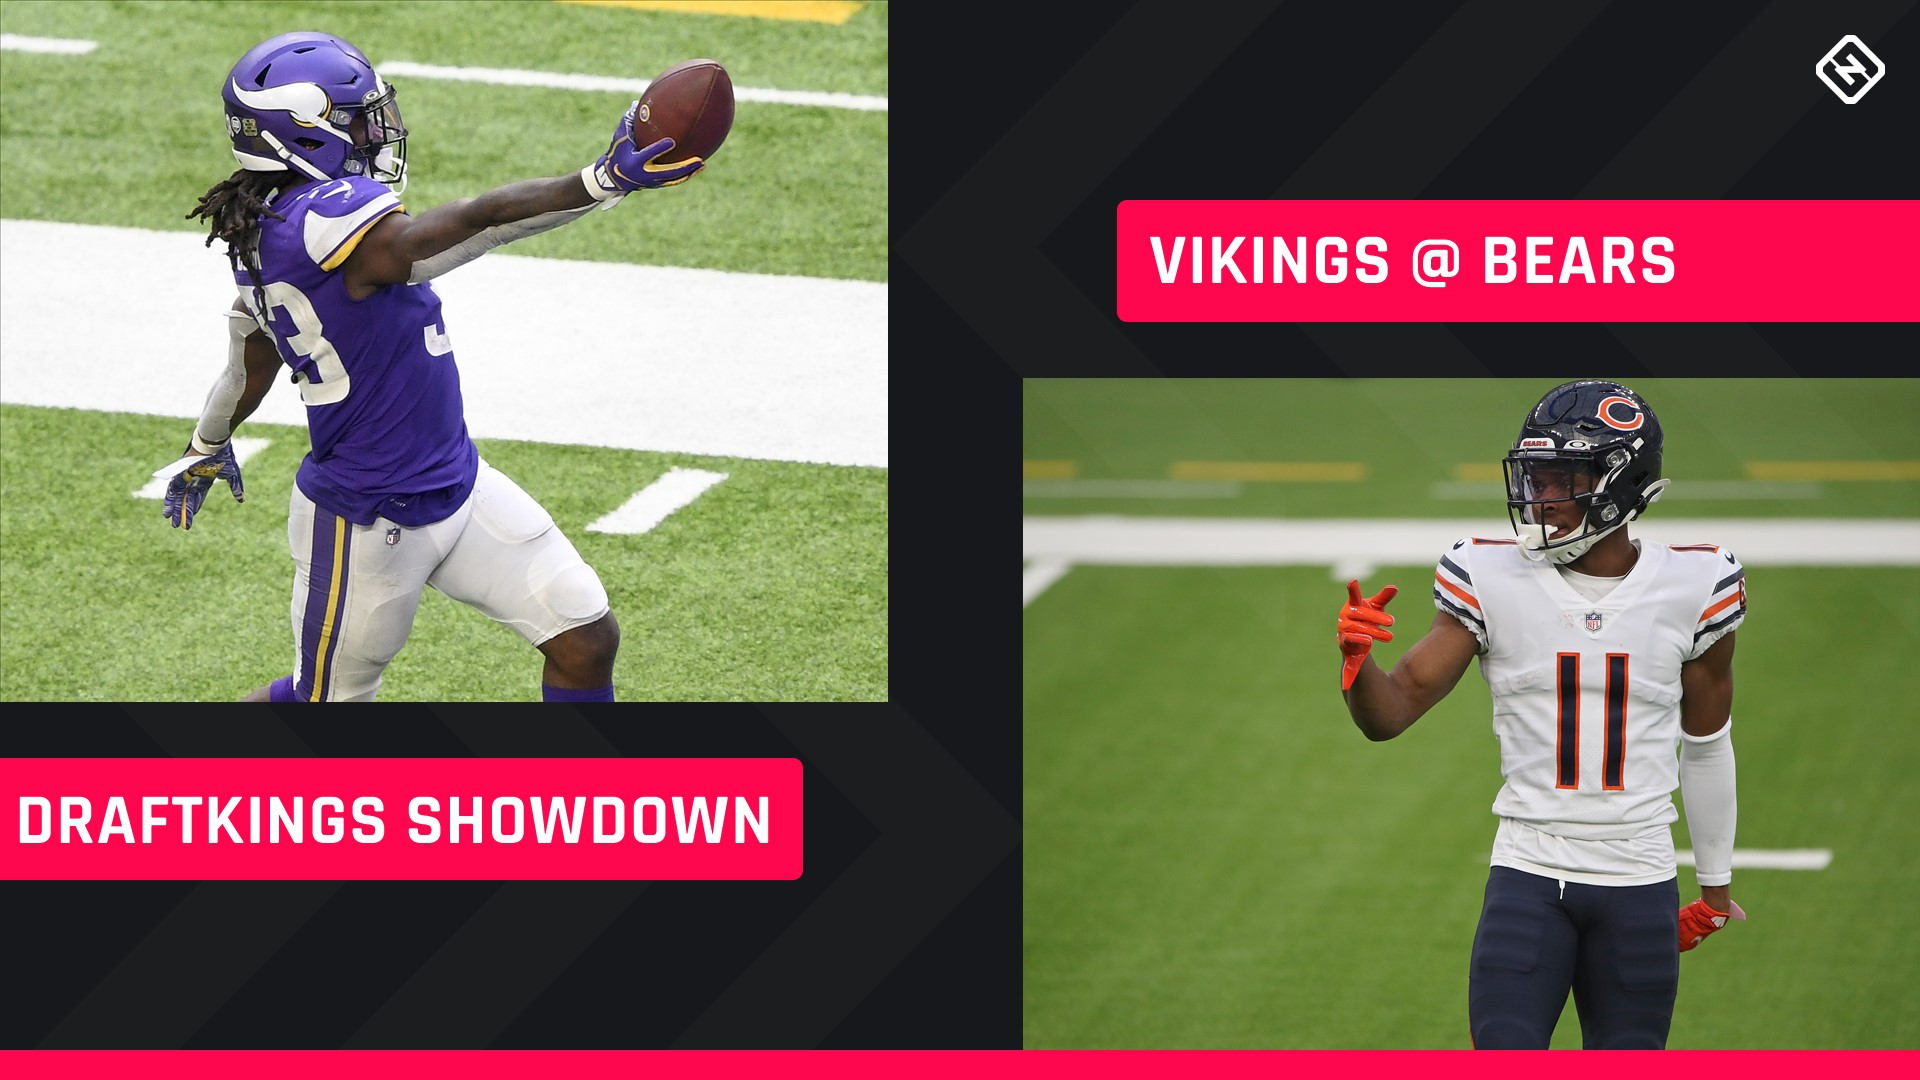 Monday Night Football DraftKings Picks: NFL DFS lineup advice for Week 10 Bears-Vikings Showdown tournaments